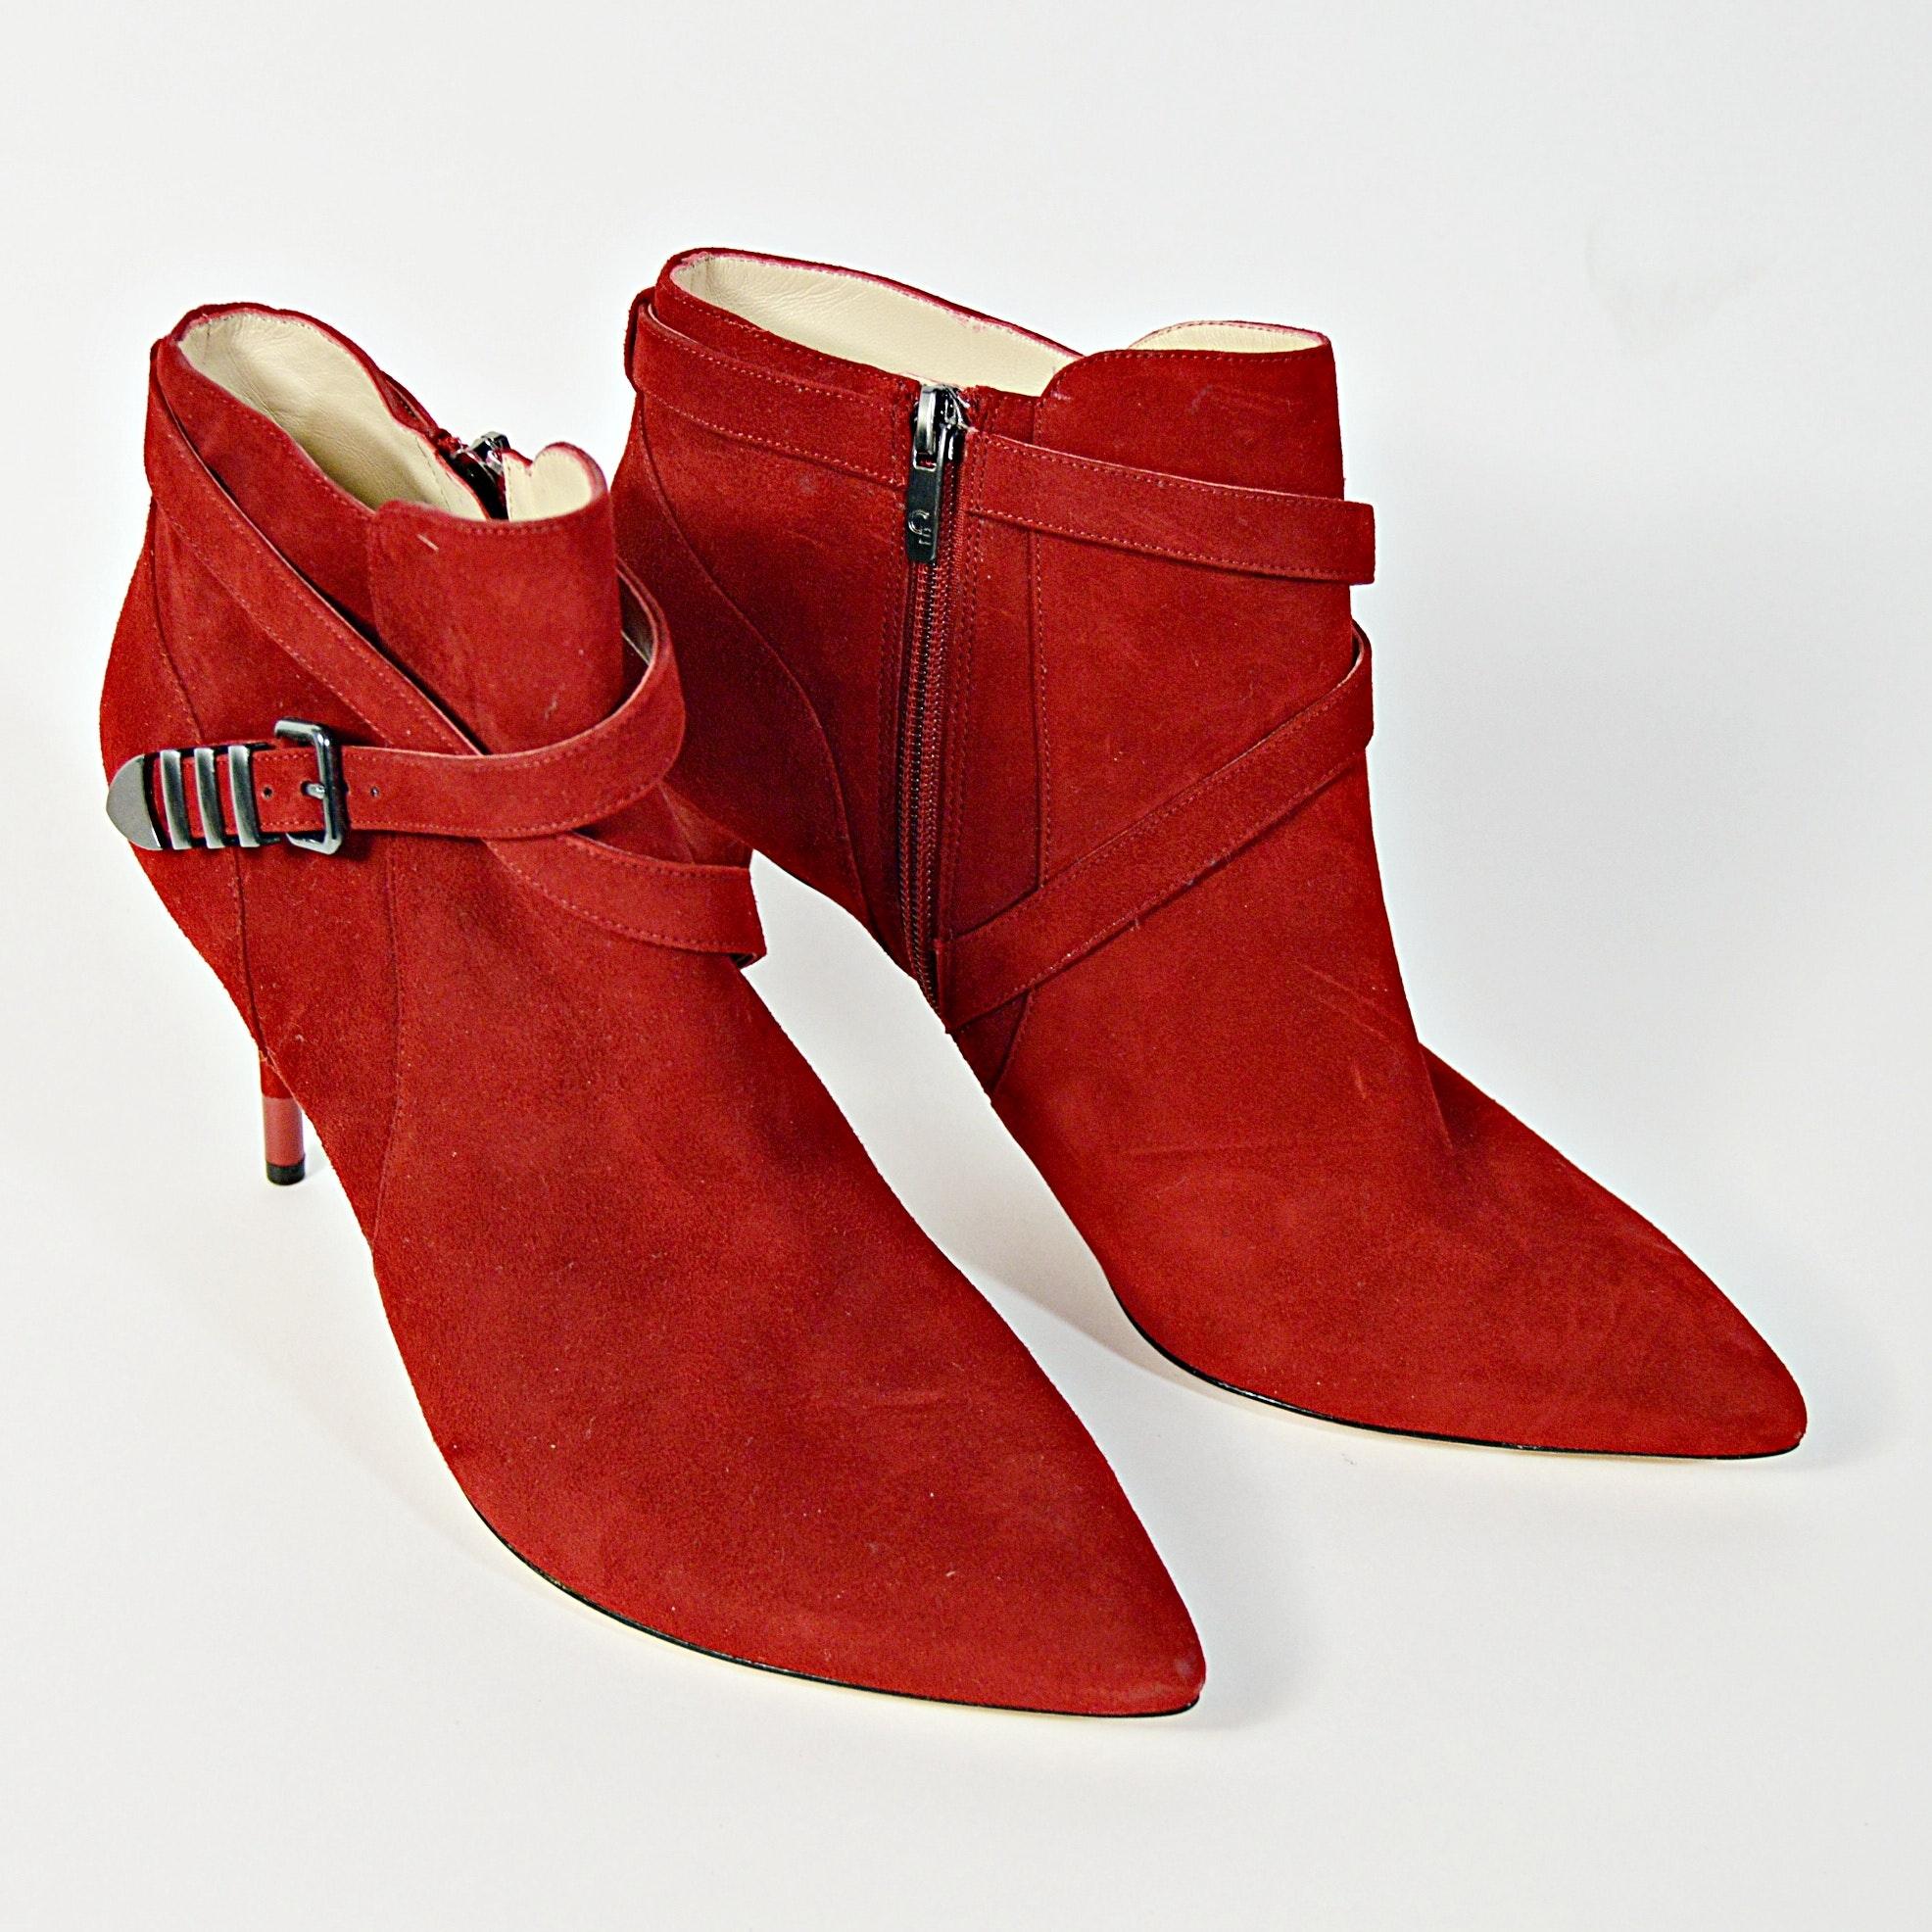 Carolinna Espinosa Red Suede Boots, 10M